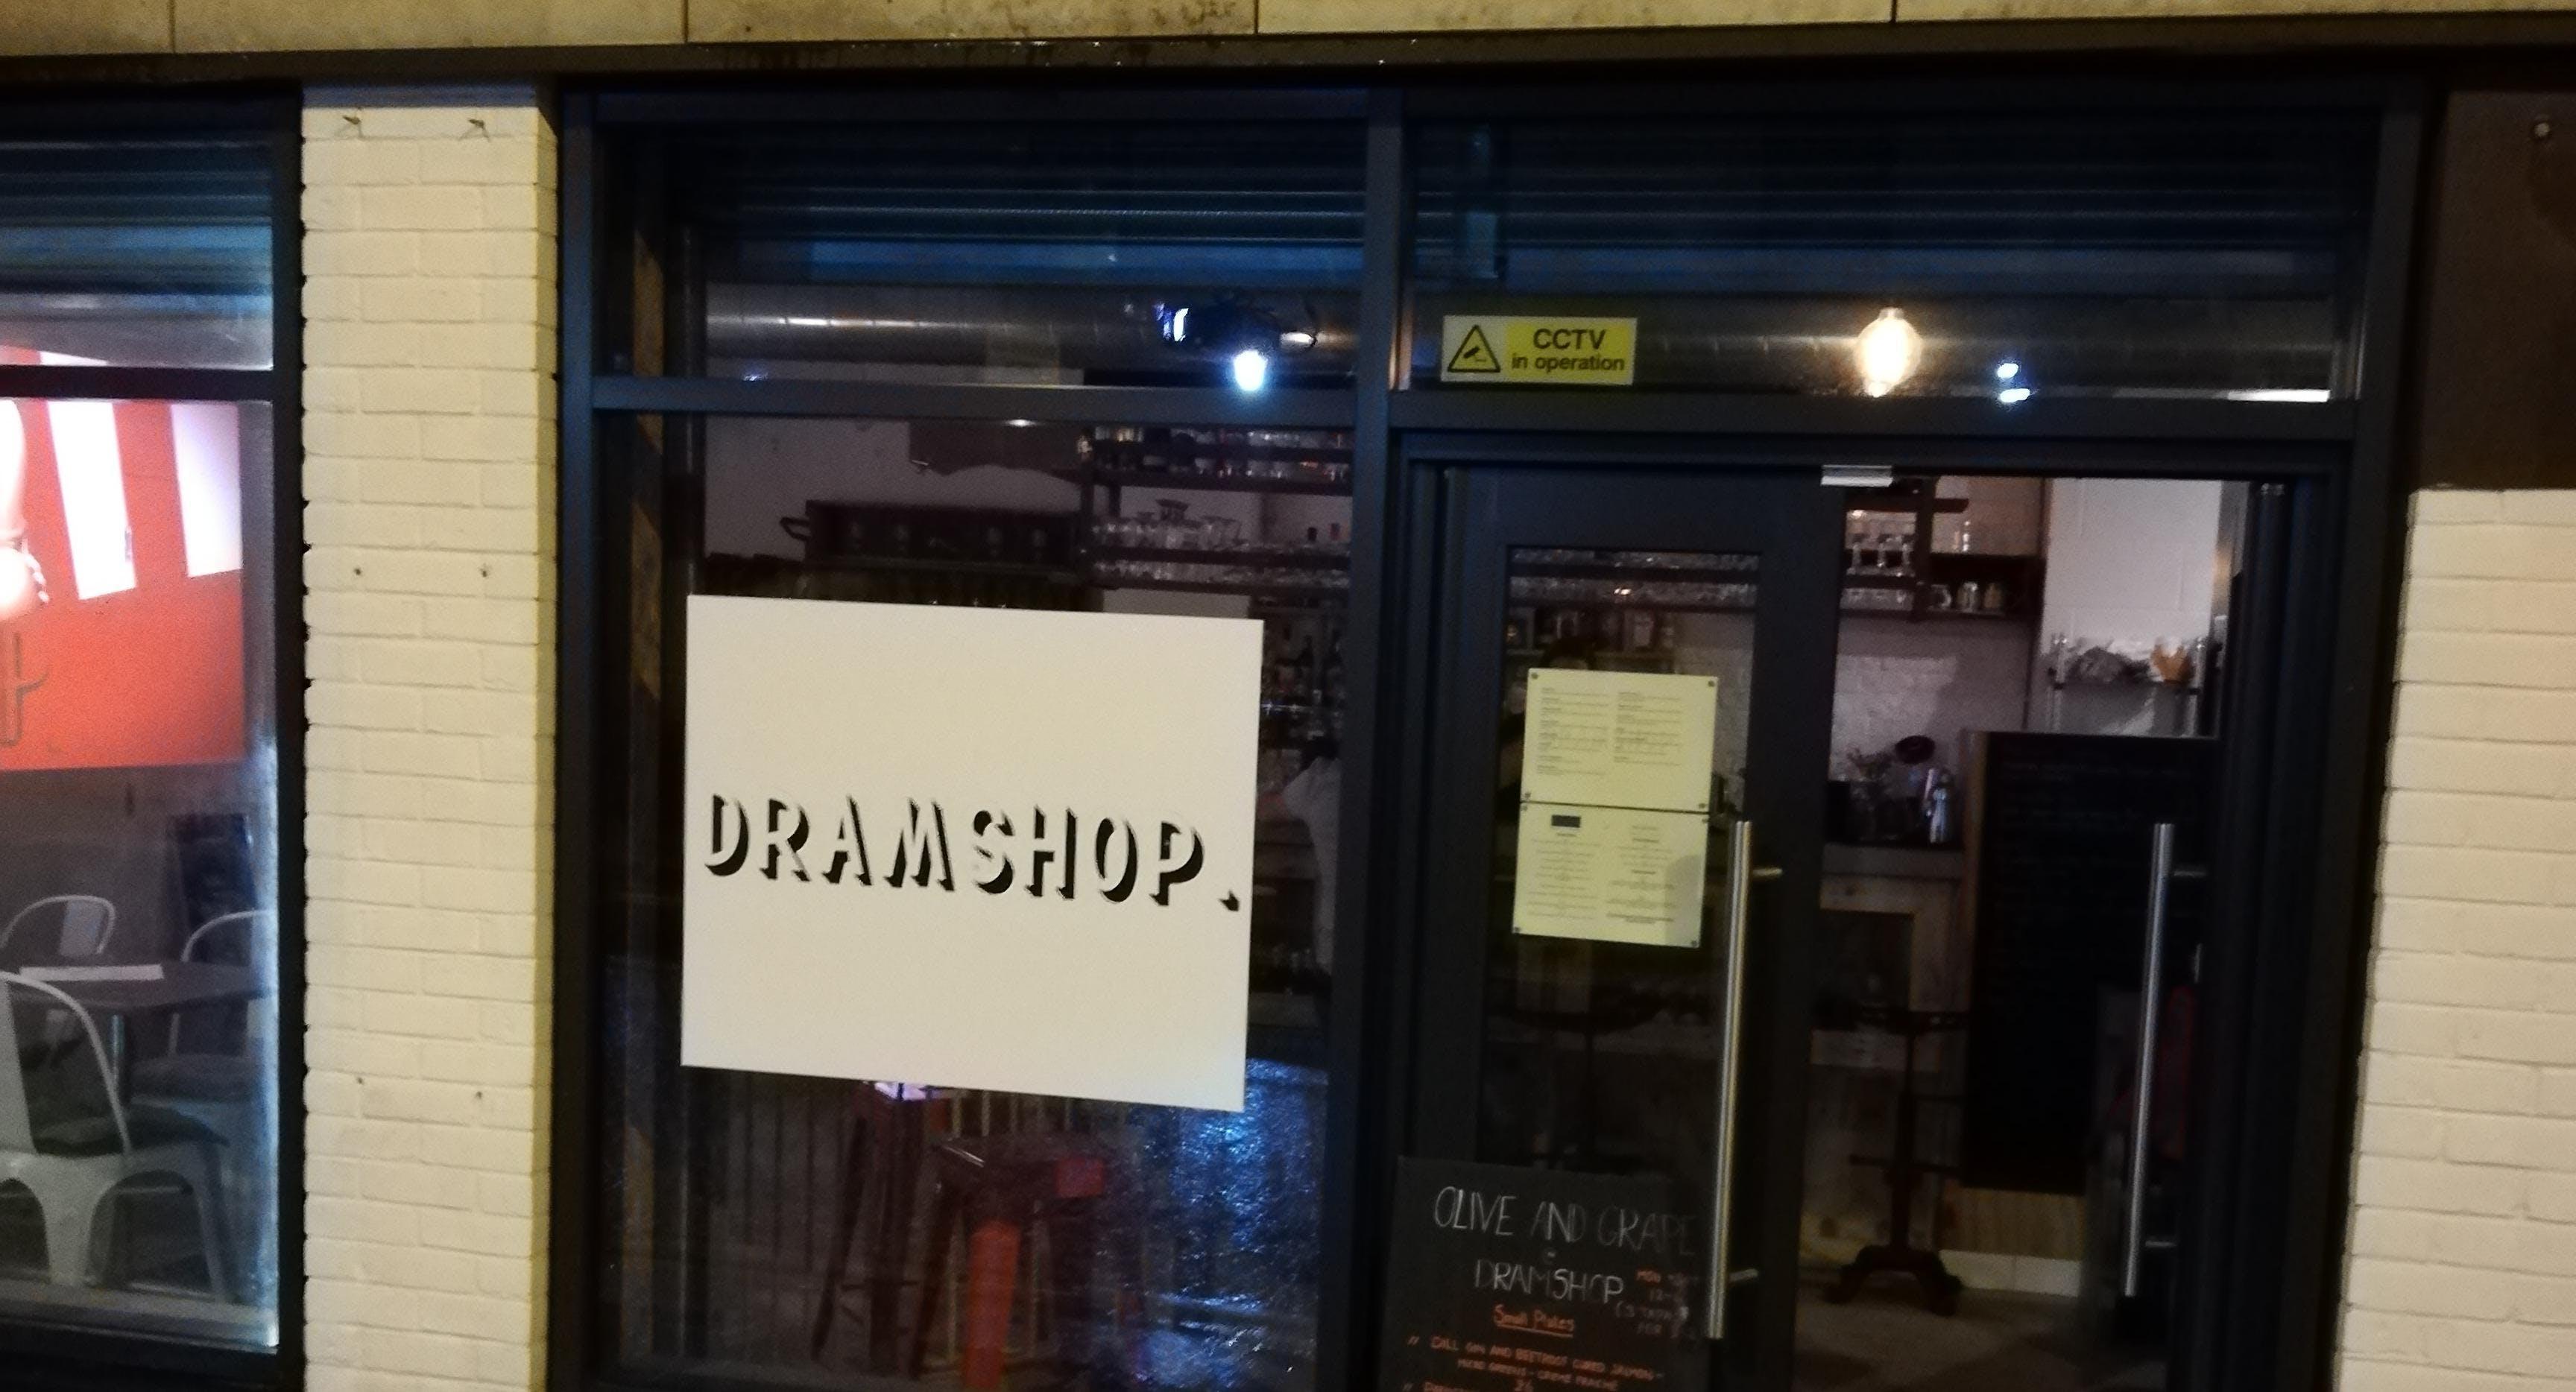 Dramshop Liverpool image 1